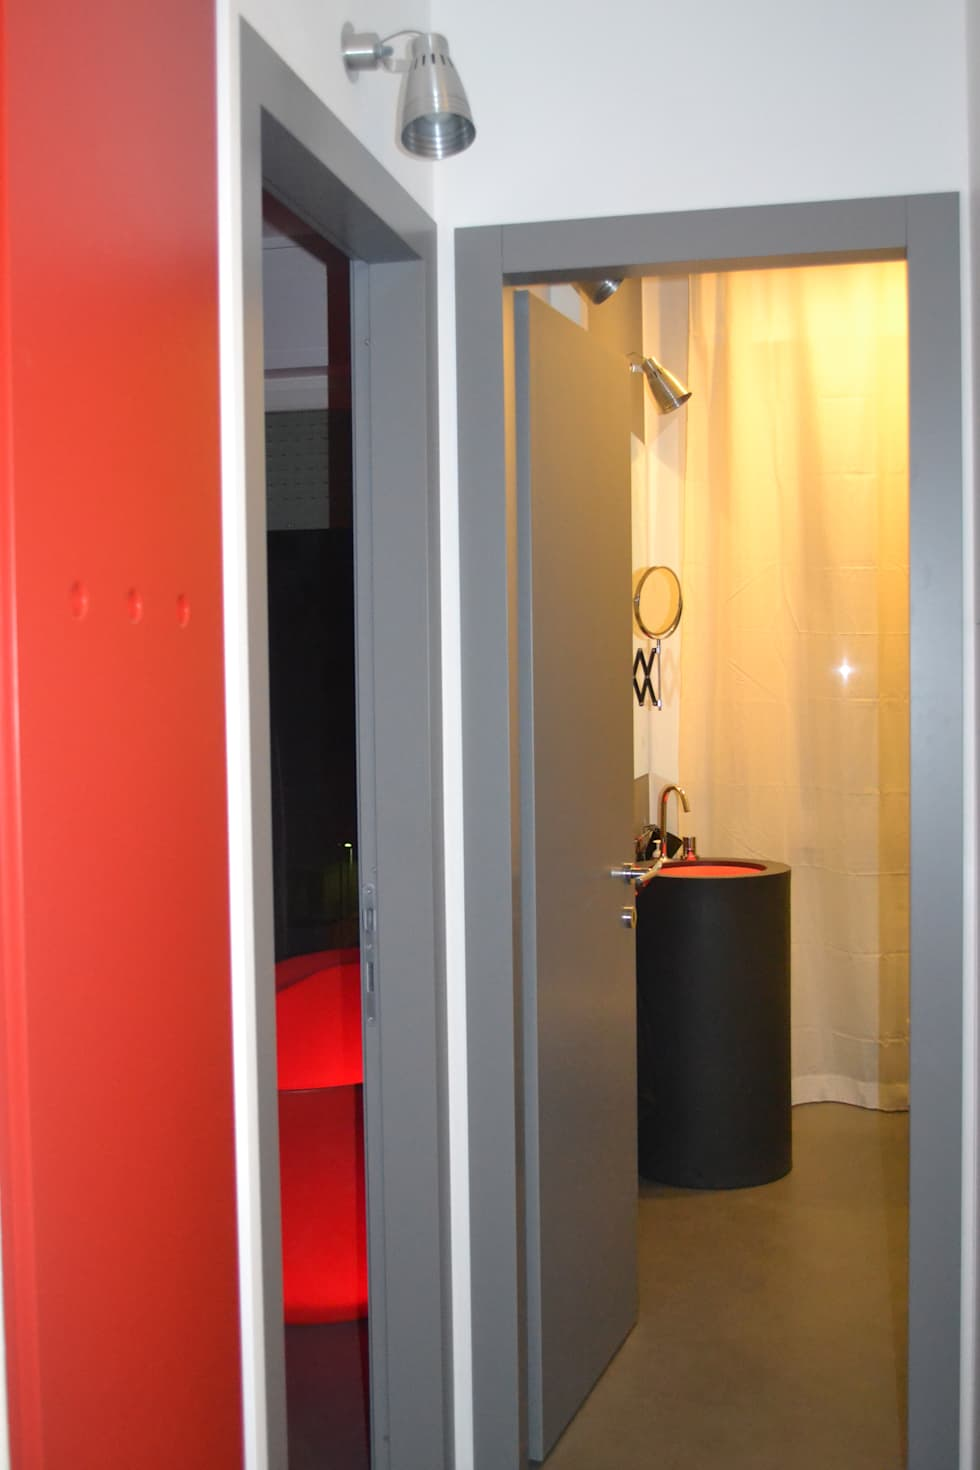 Sanitari luminosi: Spa in stile in stile Moderno di LUTOPIE Luisa Bernasconi